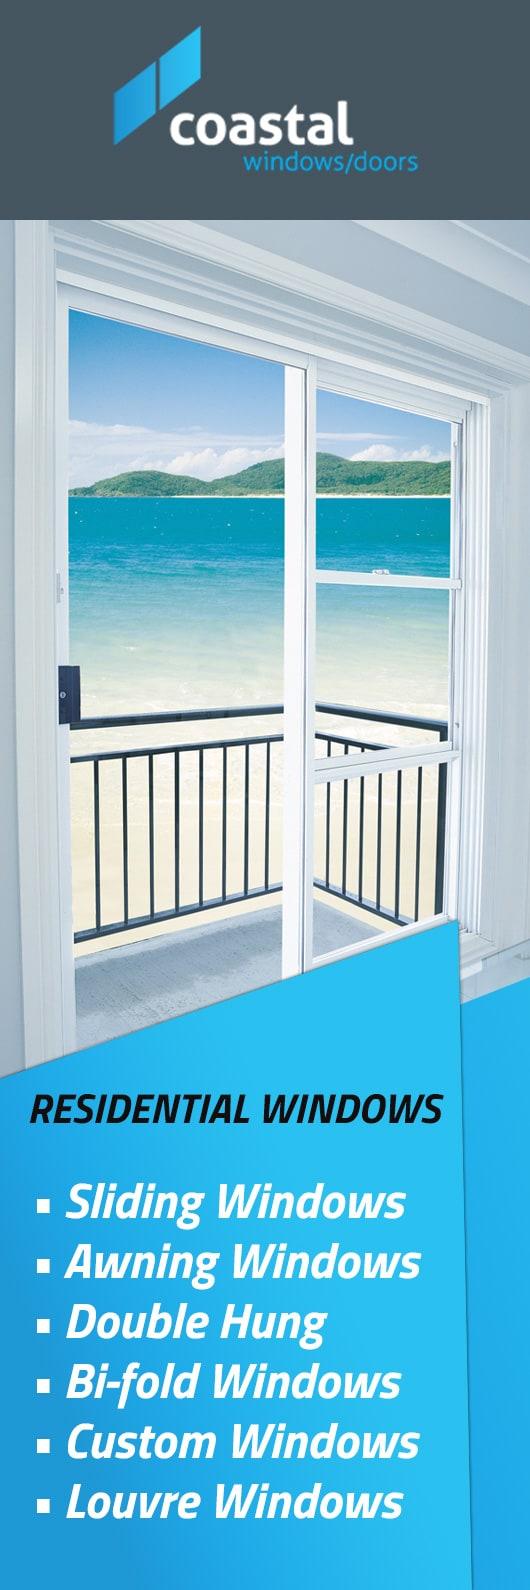 Coastal Windows \u0026 Doors - Promotion & Coastal Windows \u0026 Doors - Aluminium Windows - NOWRA